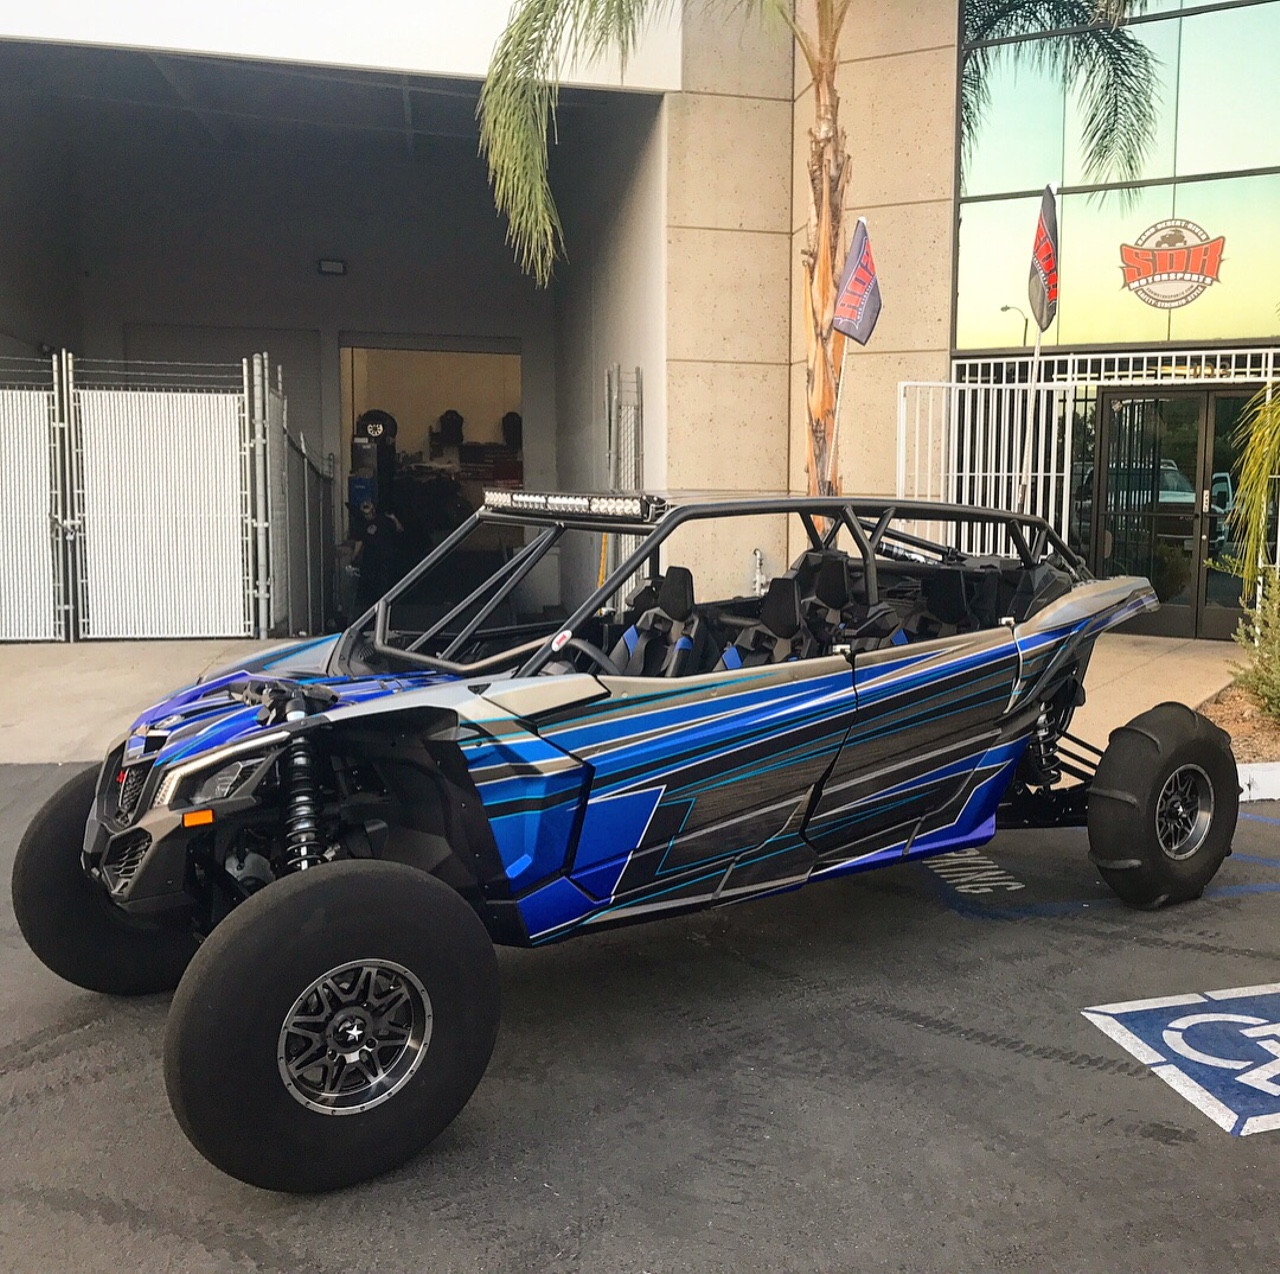 X 3 Maxx Sport Cage Can Am Maverick X3 Maxx Sdr